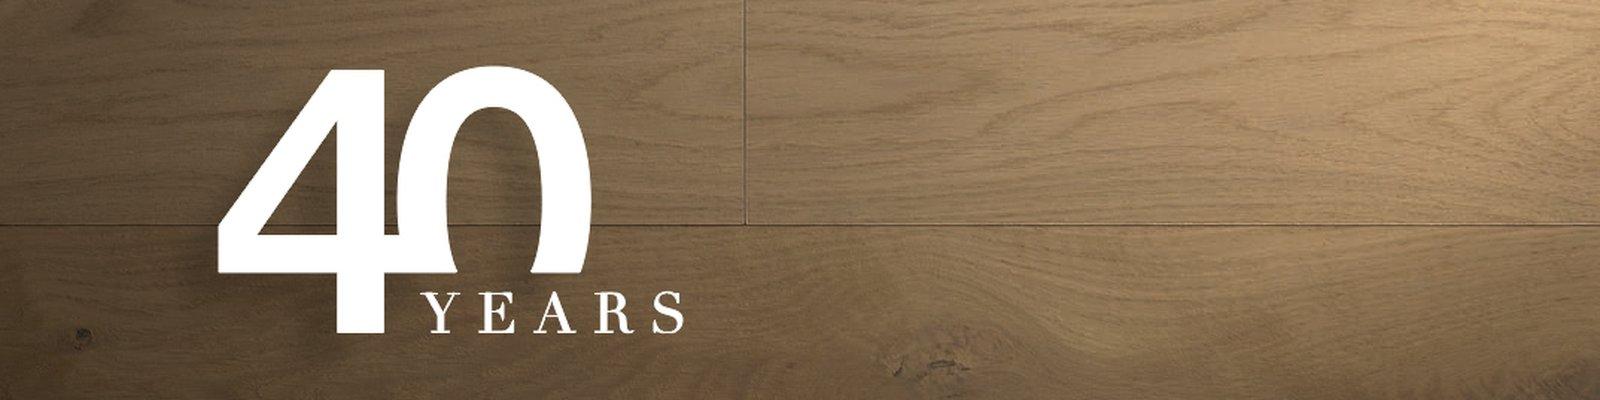 40 years ago, Mercier became the original prefinished wood flooring.